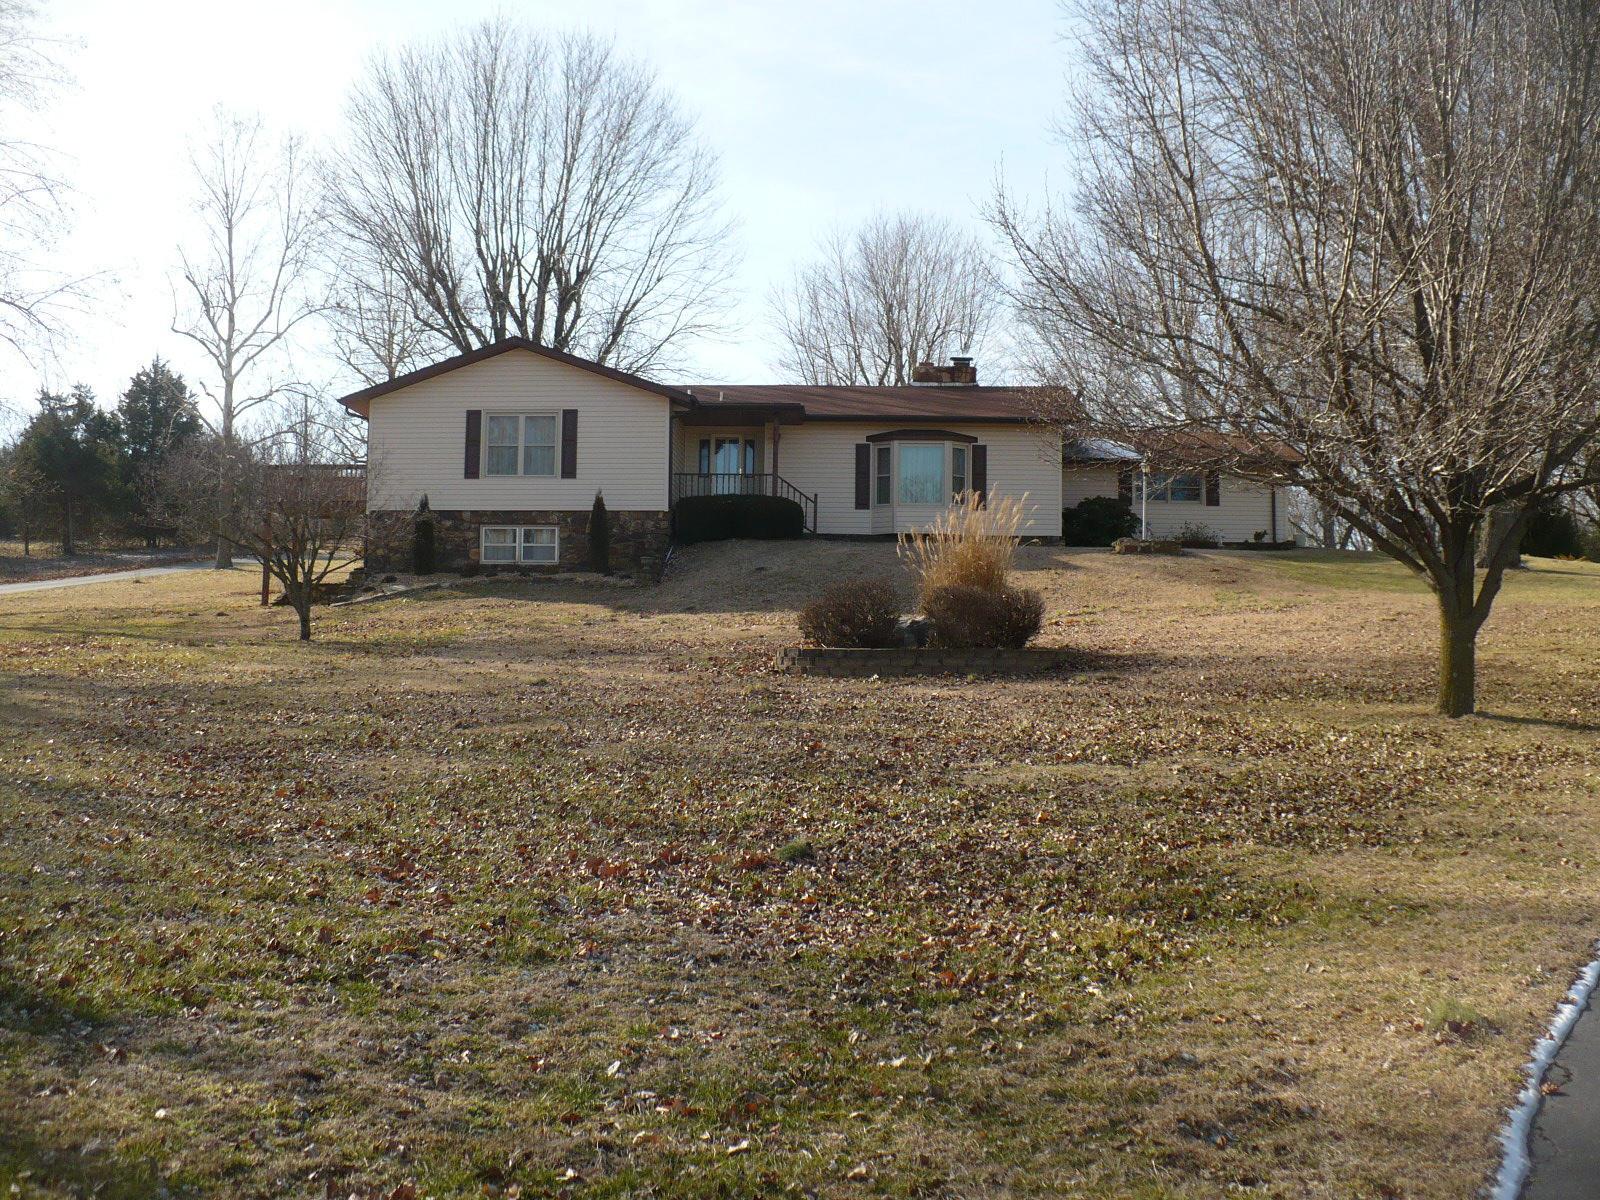 6481 S Farm Road 101, Republic, MO 65738